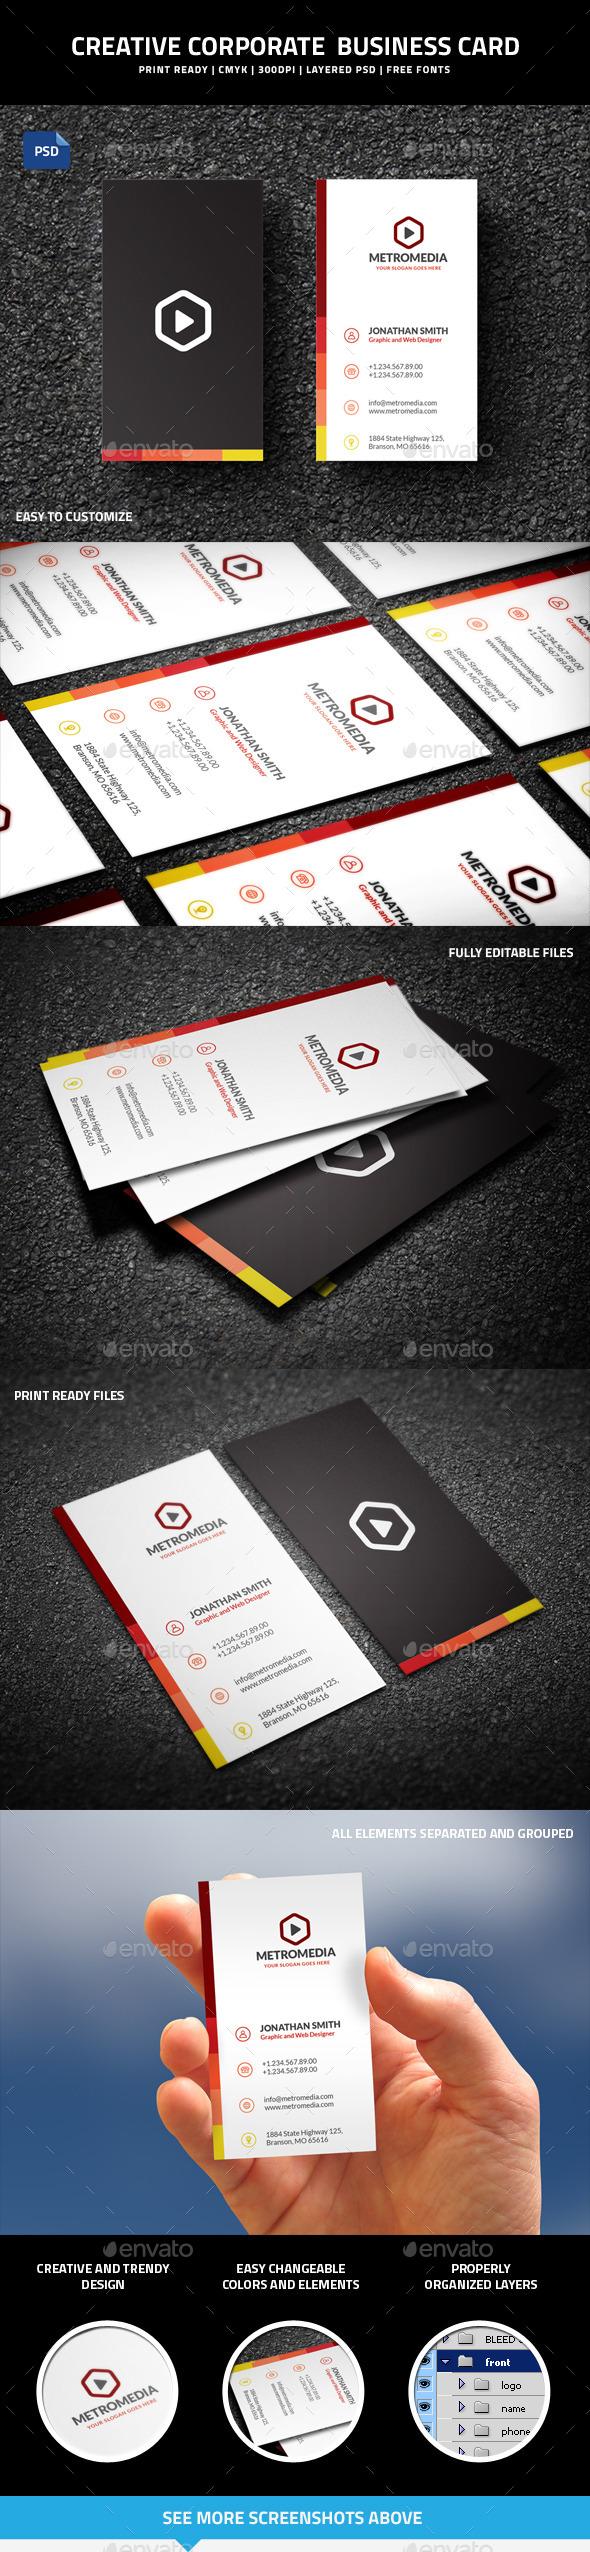 Creative Corporate Business Card - 52 - Creative Business Cards